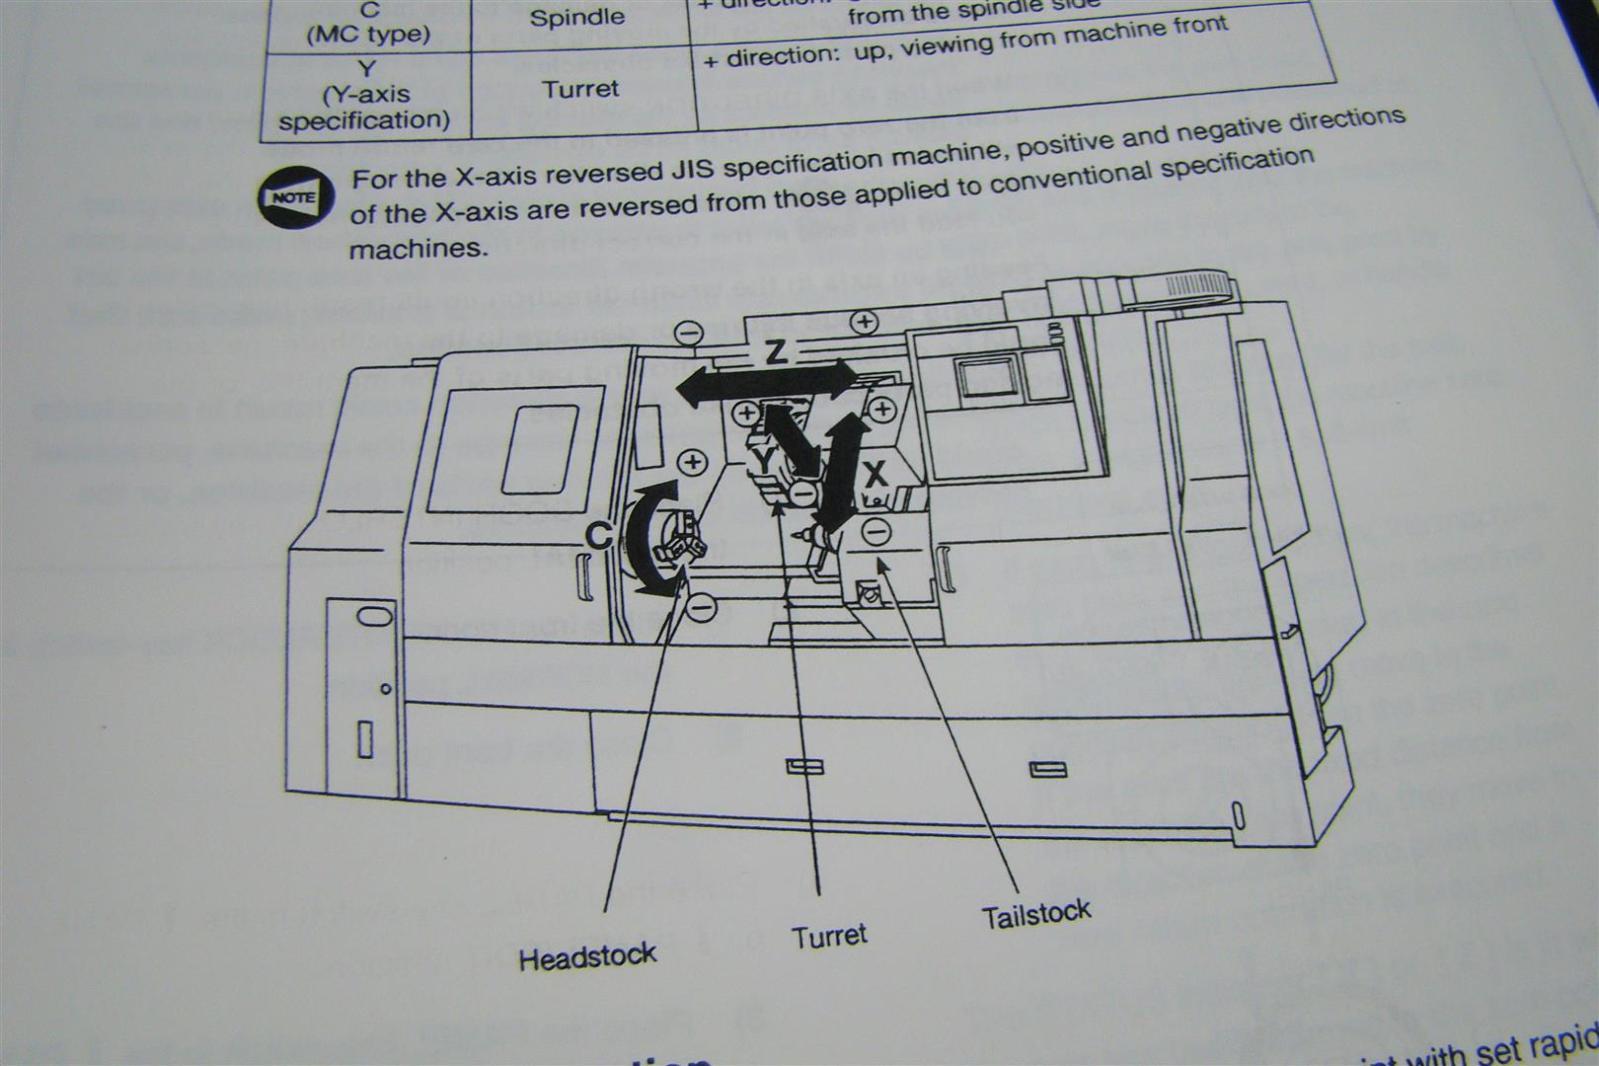 Mori seiki service manual Pdf